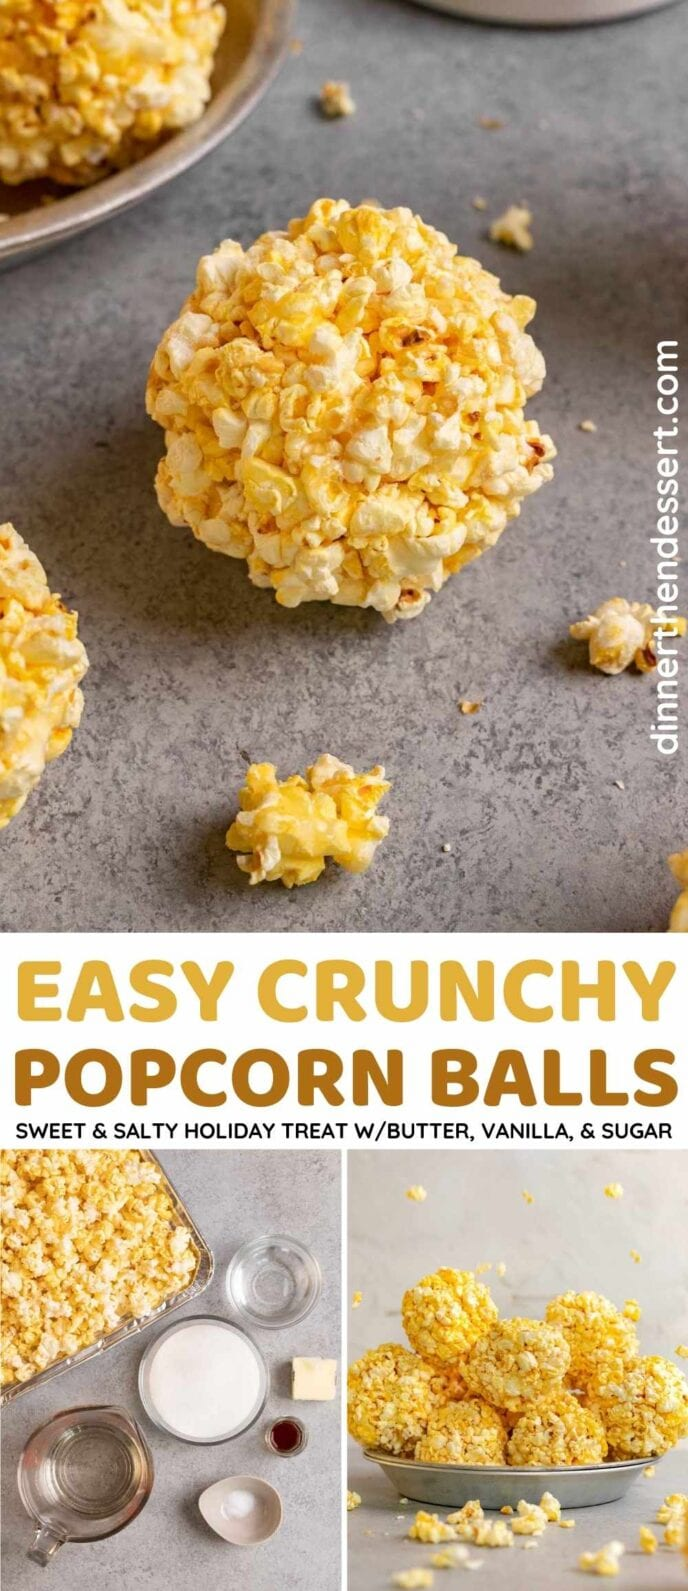 Popcorn Balls Collage